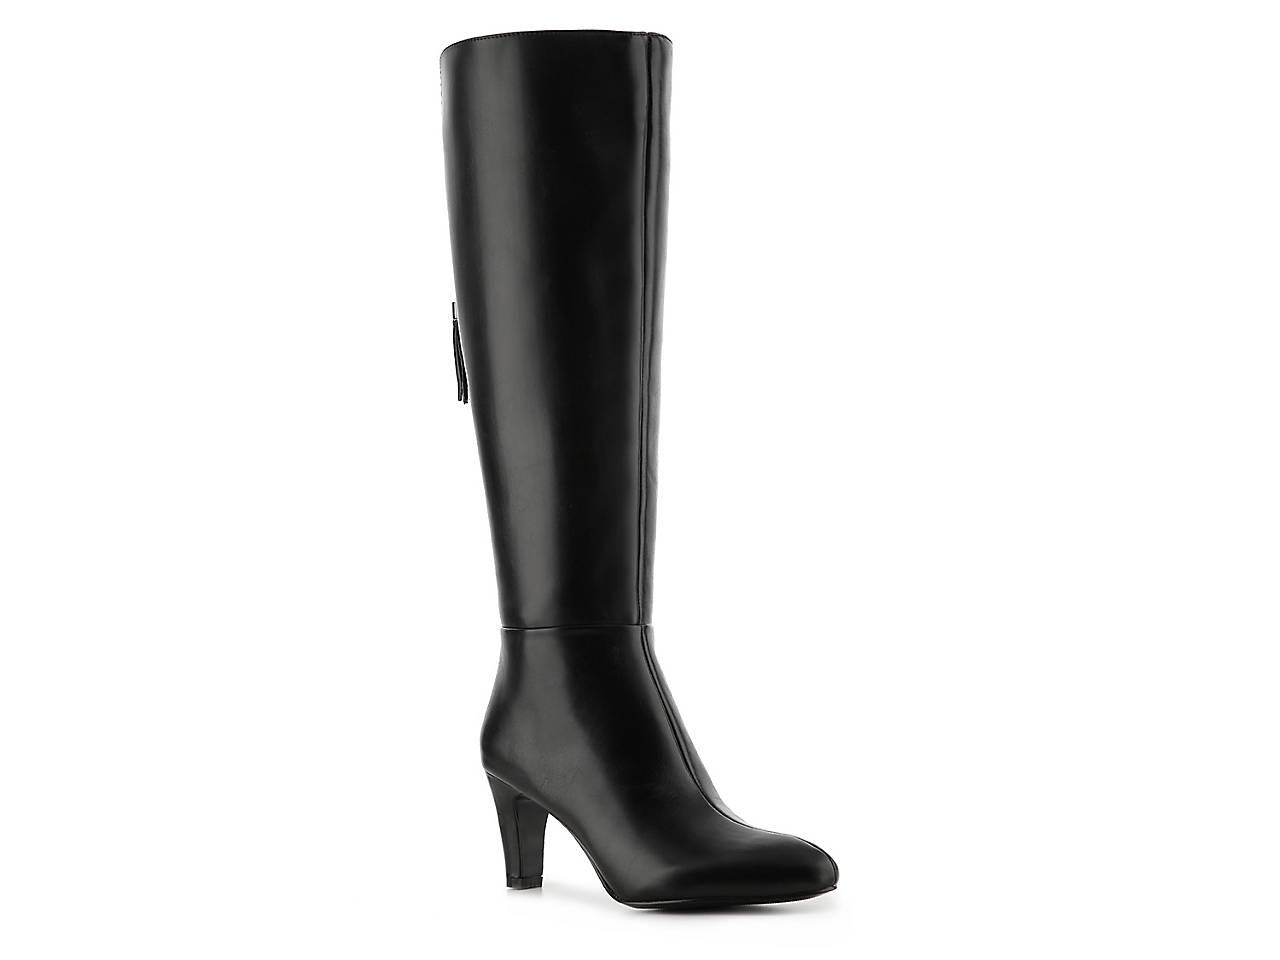 bf96f55414cf Bandolino Wendaw Wide Calf Boot Women s Shoes